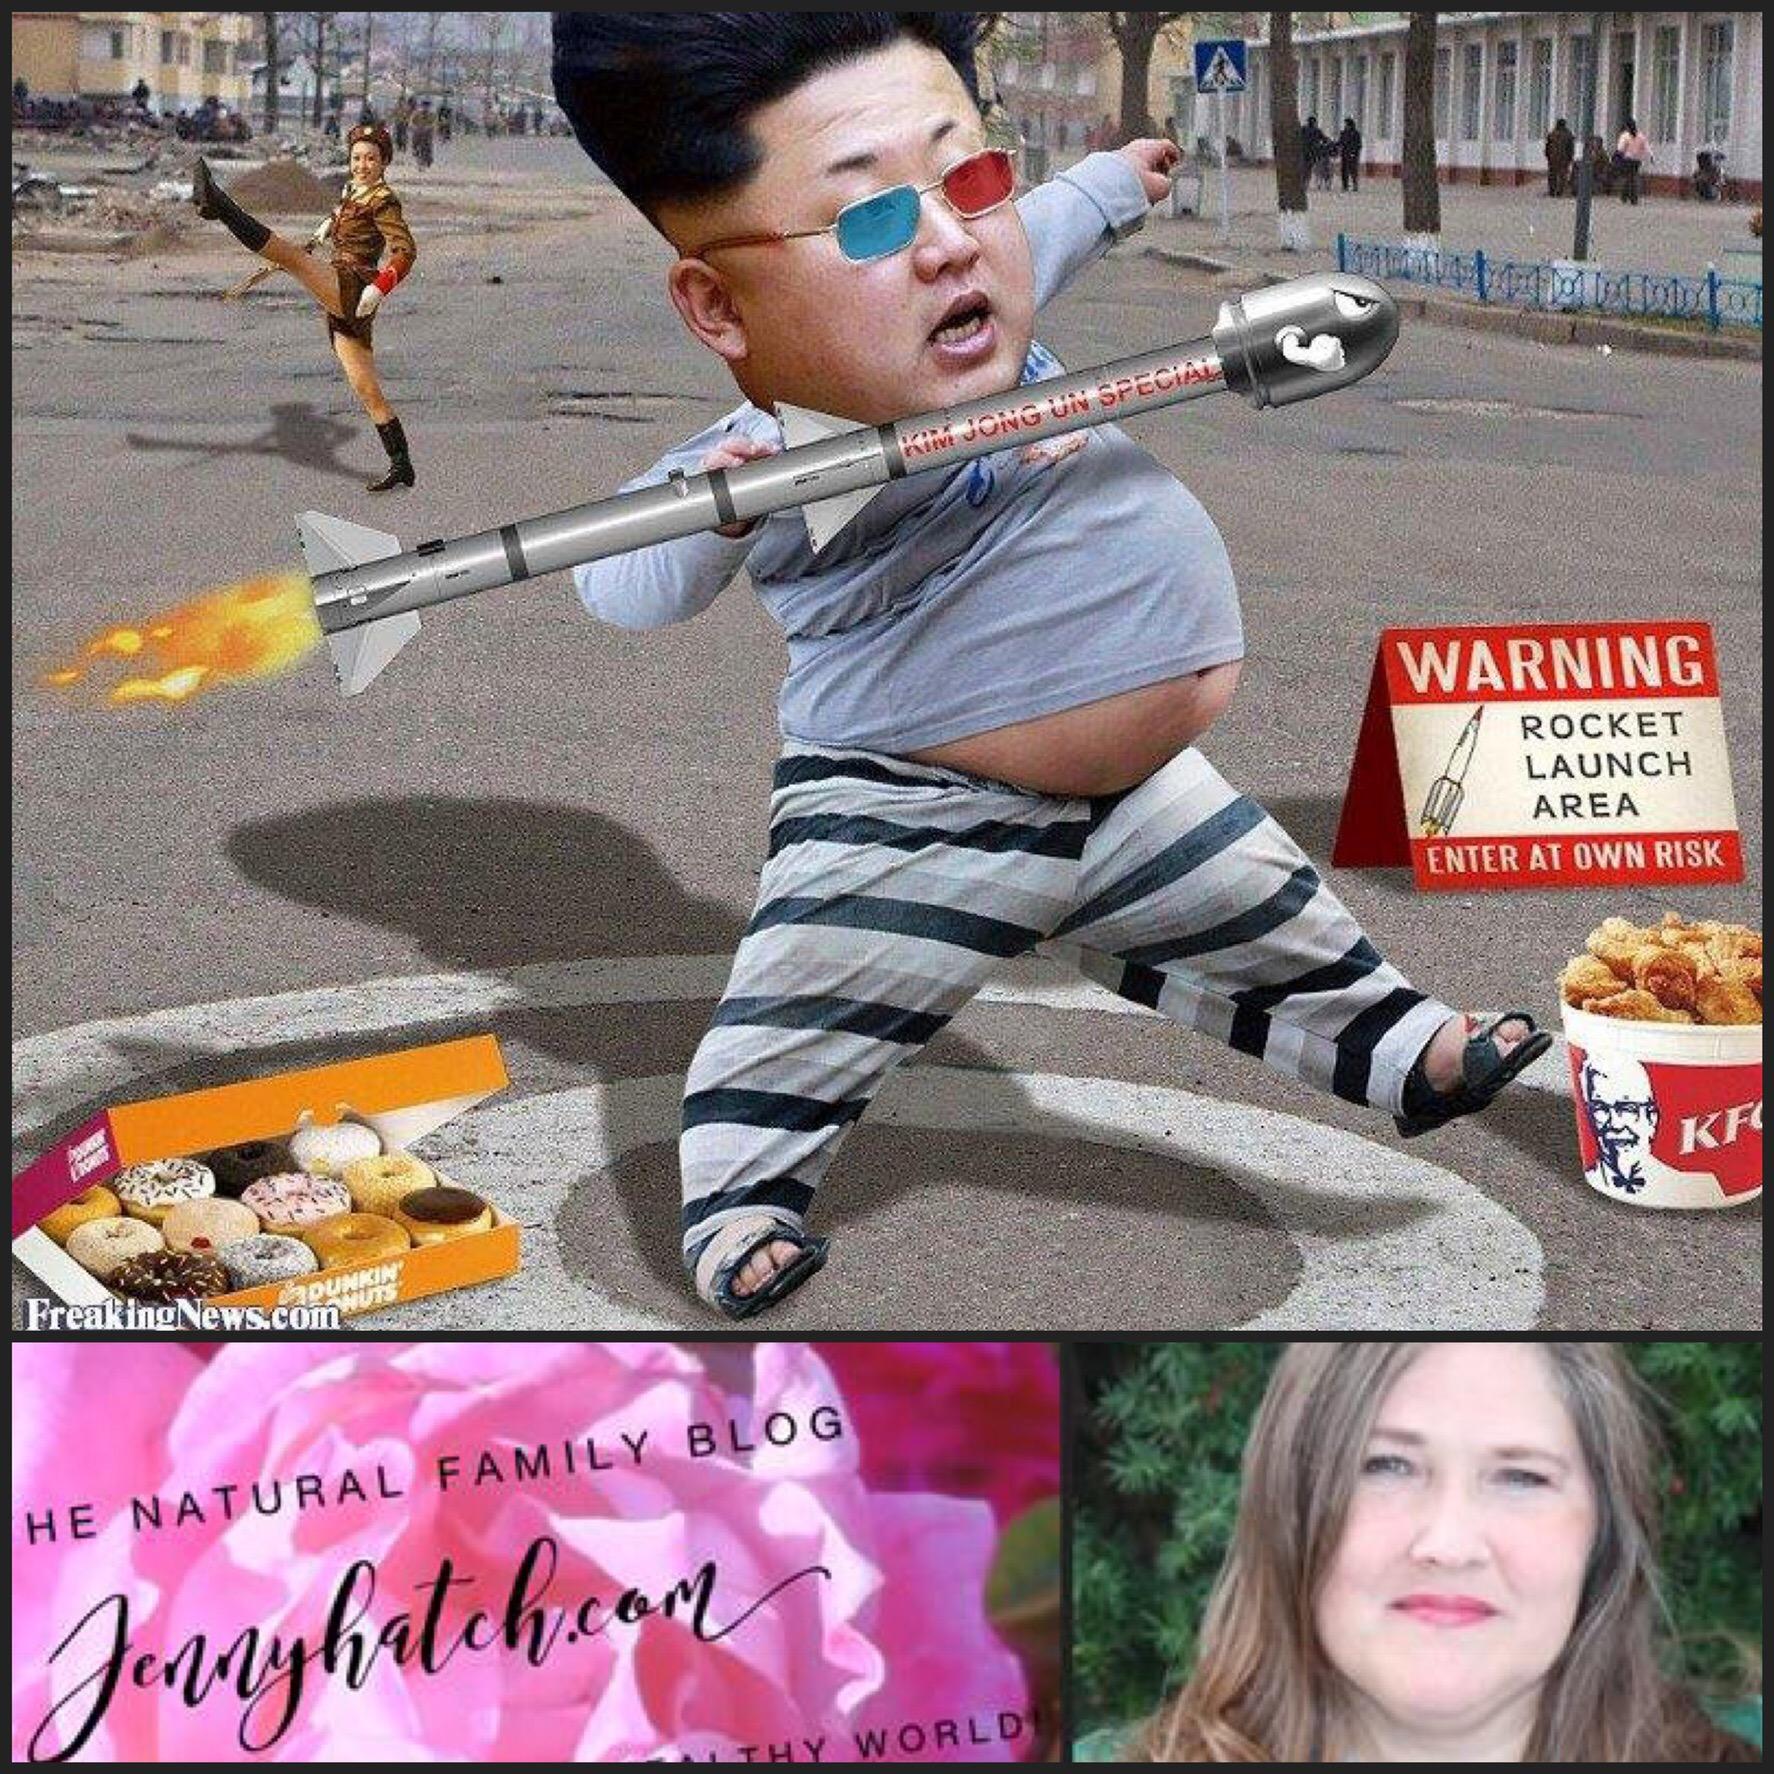 Rocketman Kim Jong Un